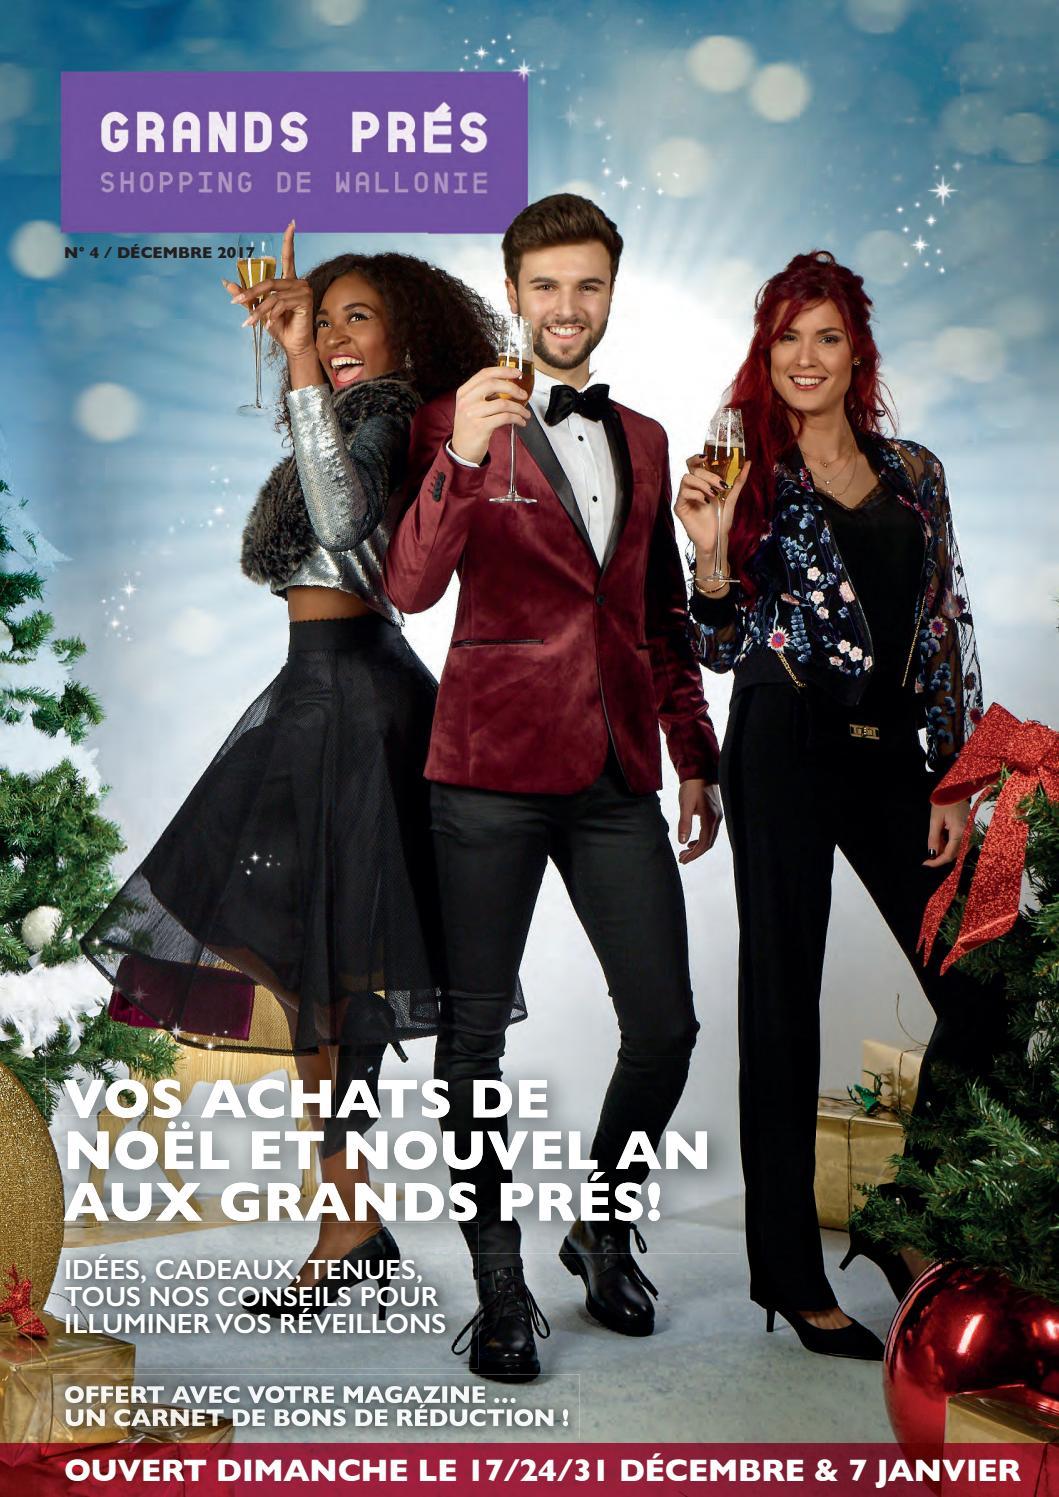 Magazine04 By Studio Tornado Grands Prés Issuu N8nw0yvmOP